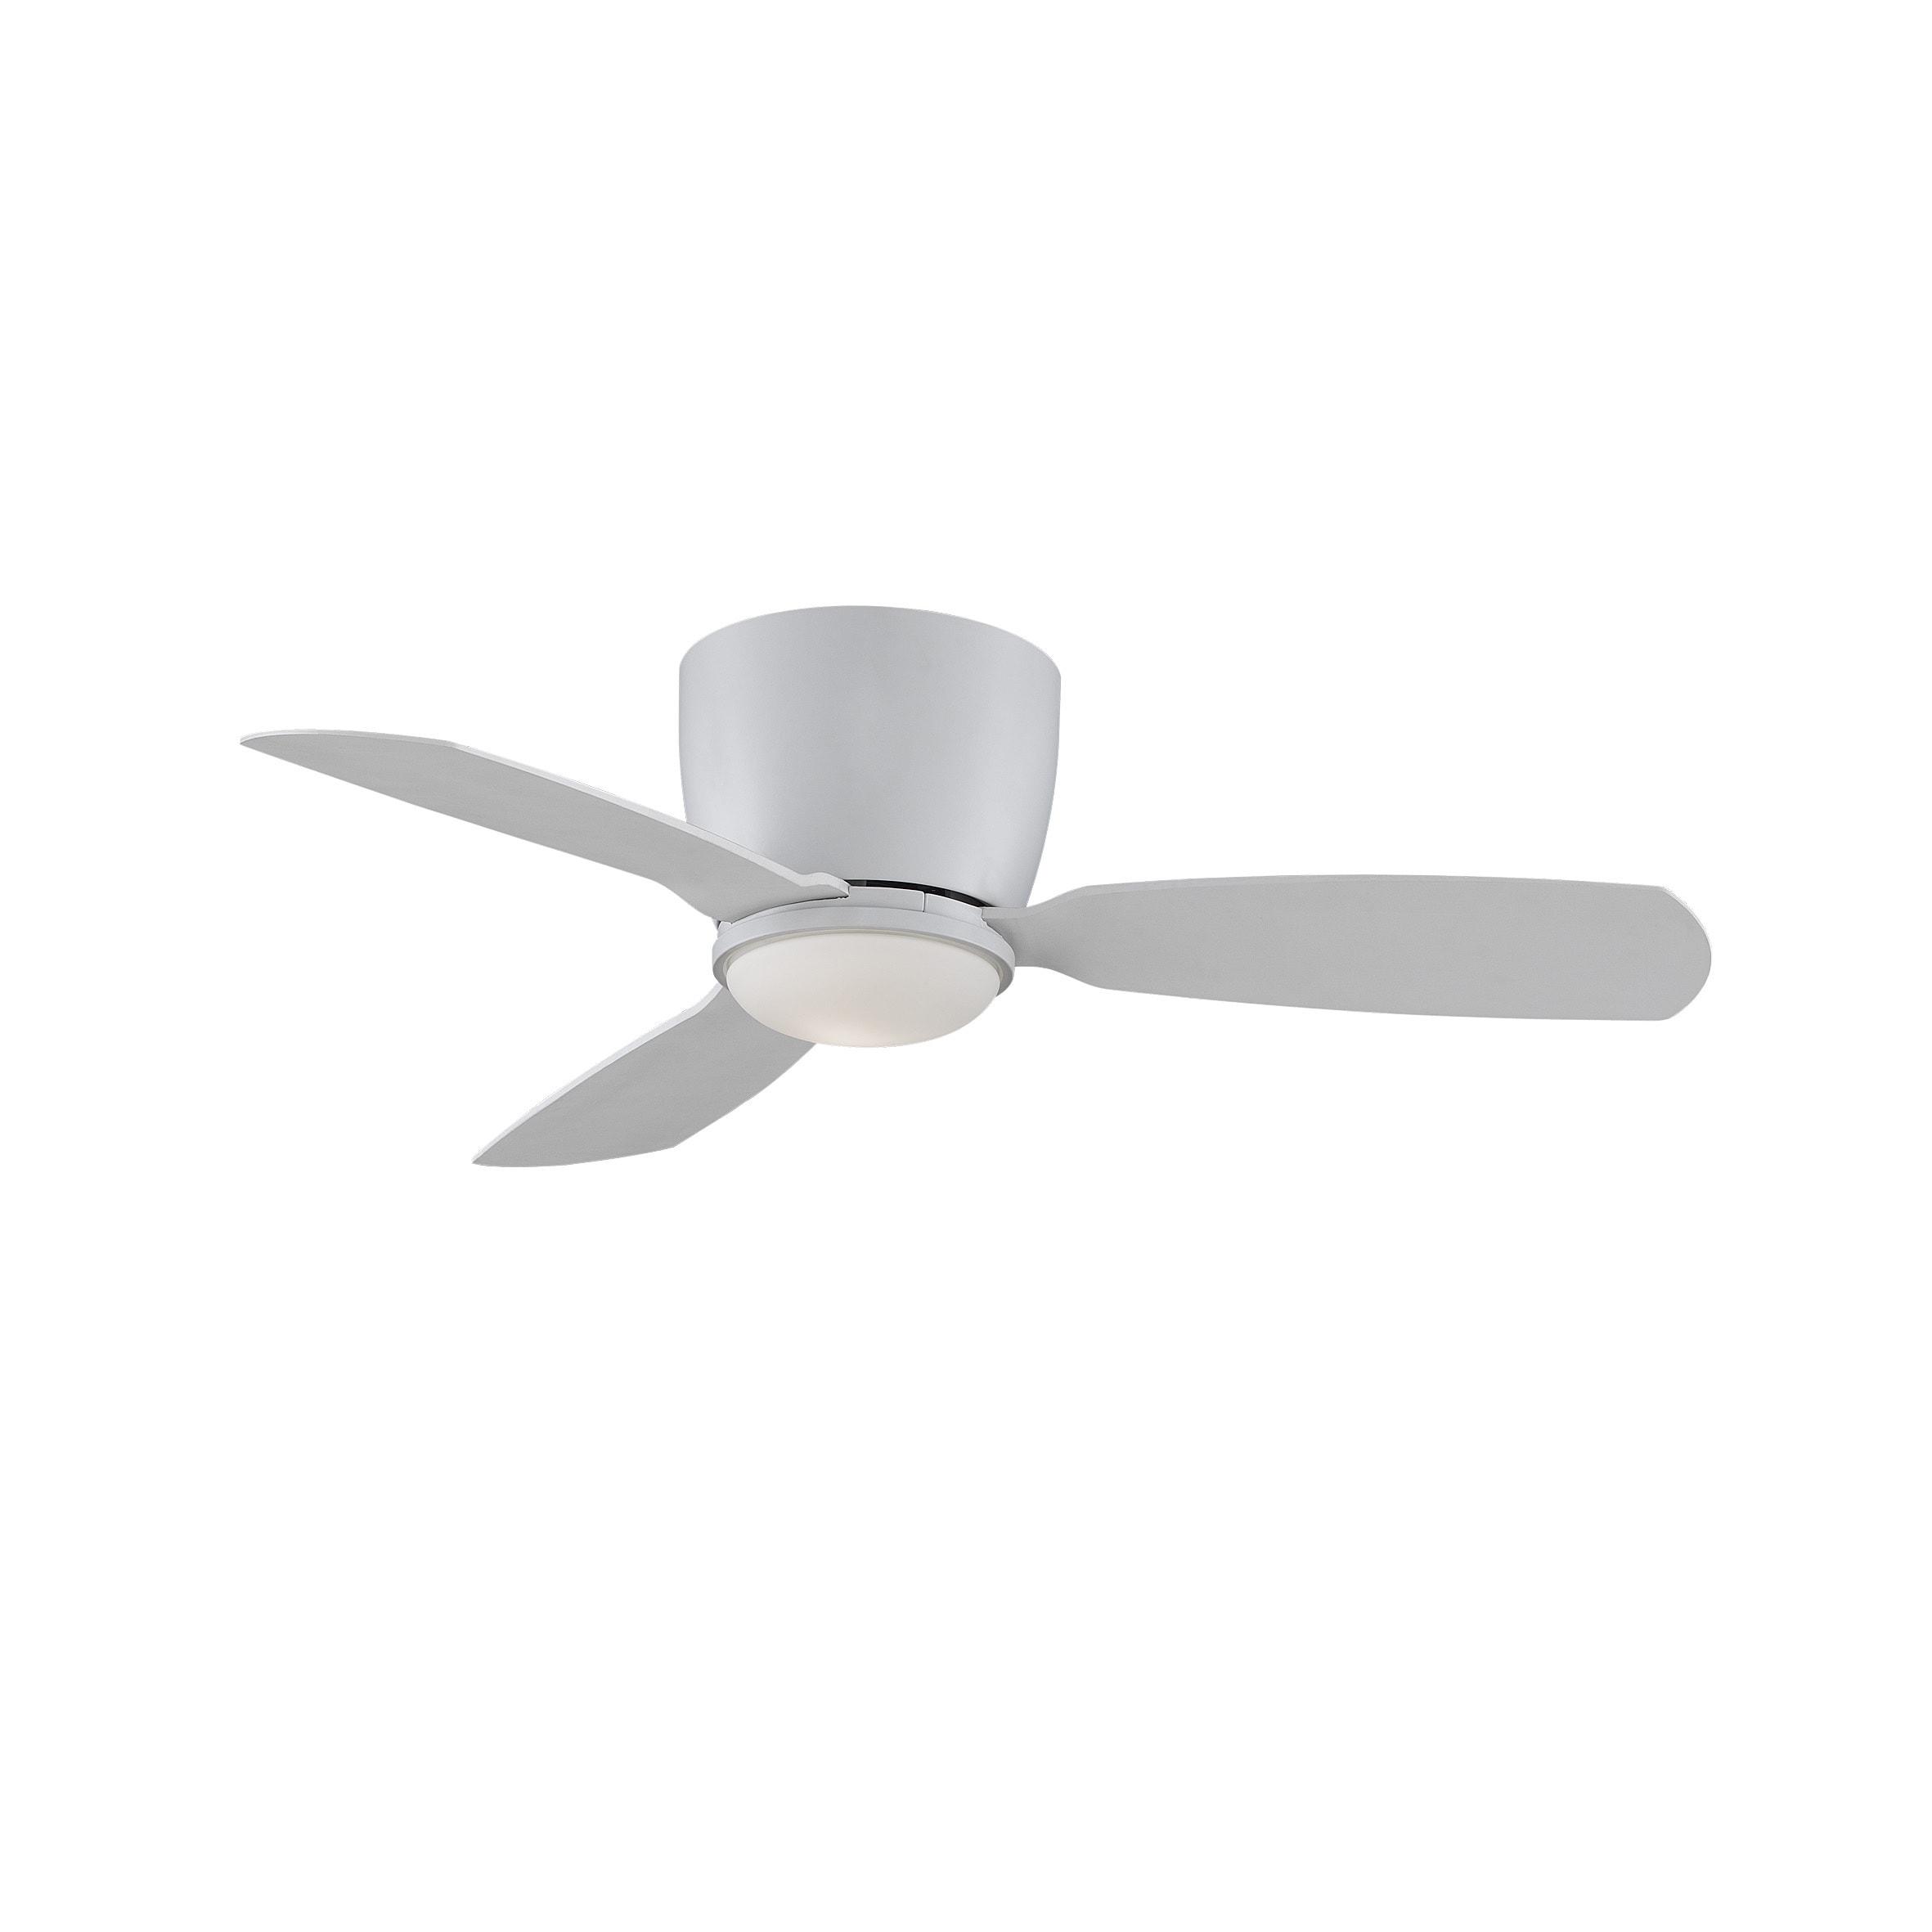 birch lighting three blade pdp minka led lane retro reviews fan acero ceiling aire ceilings